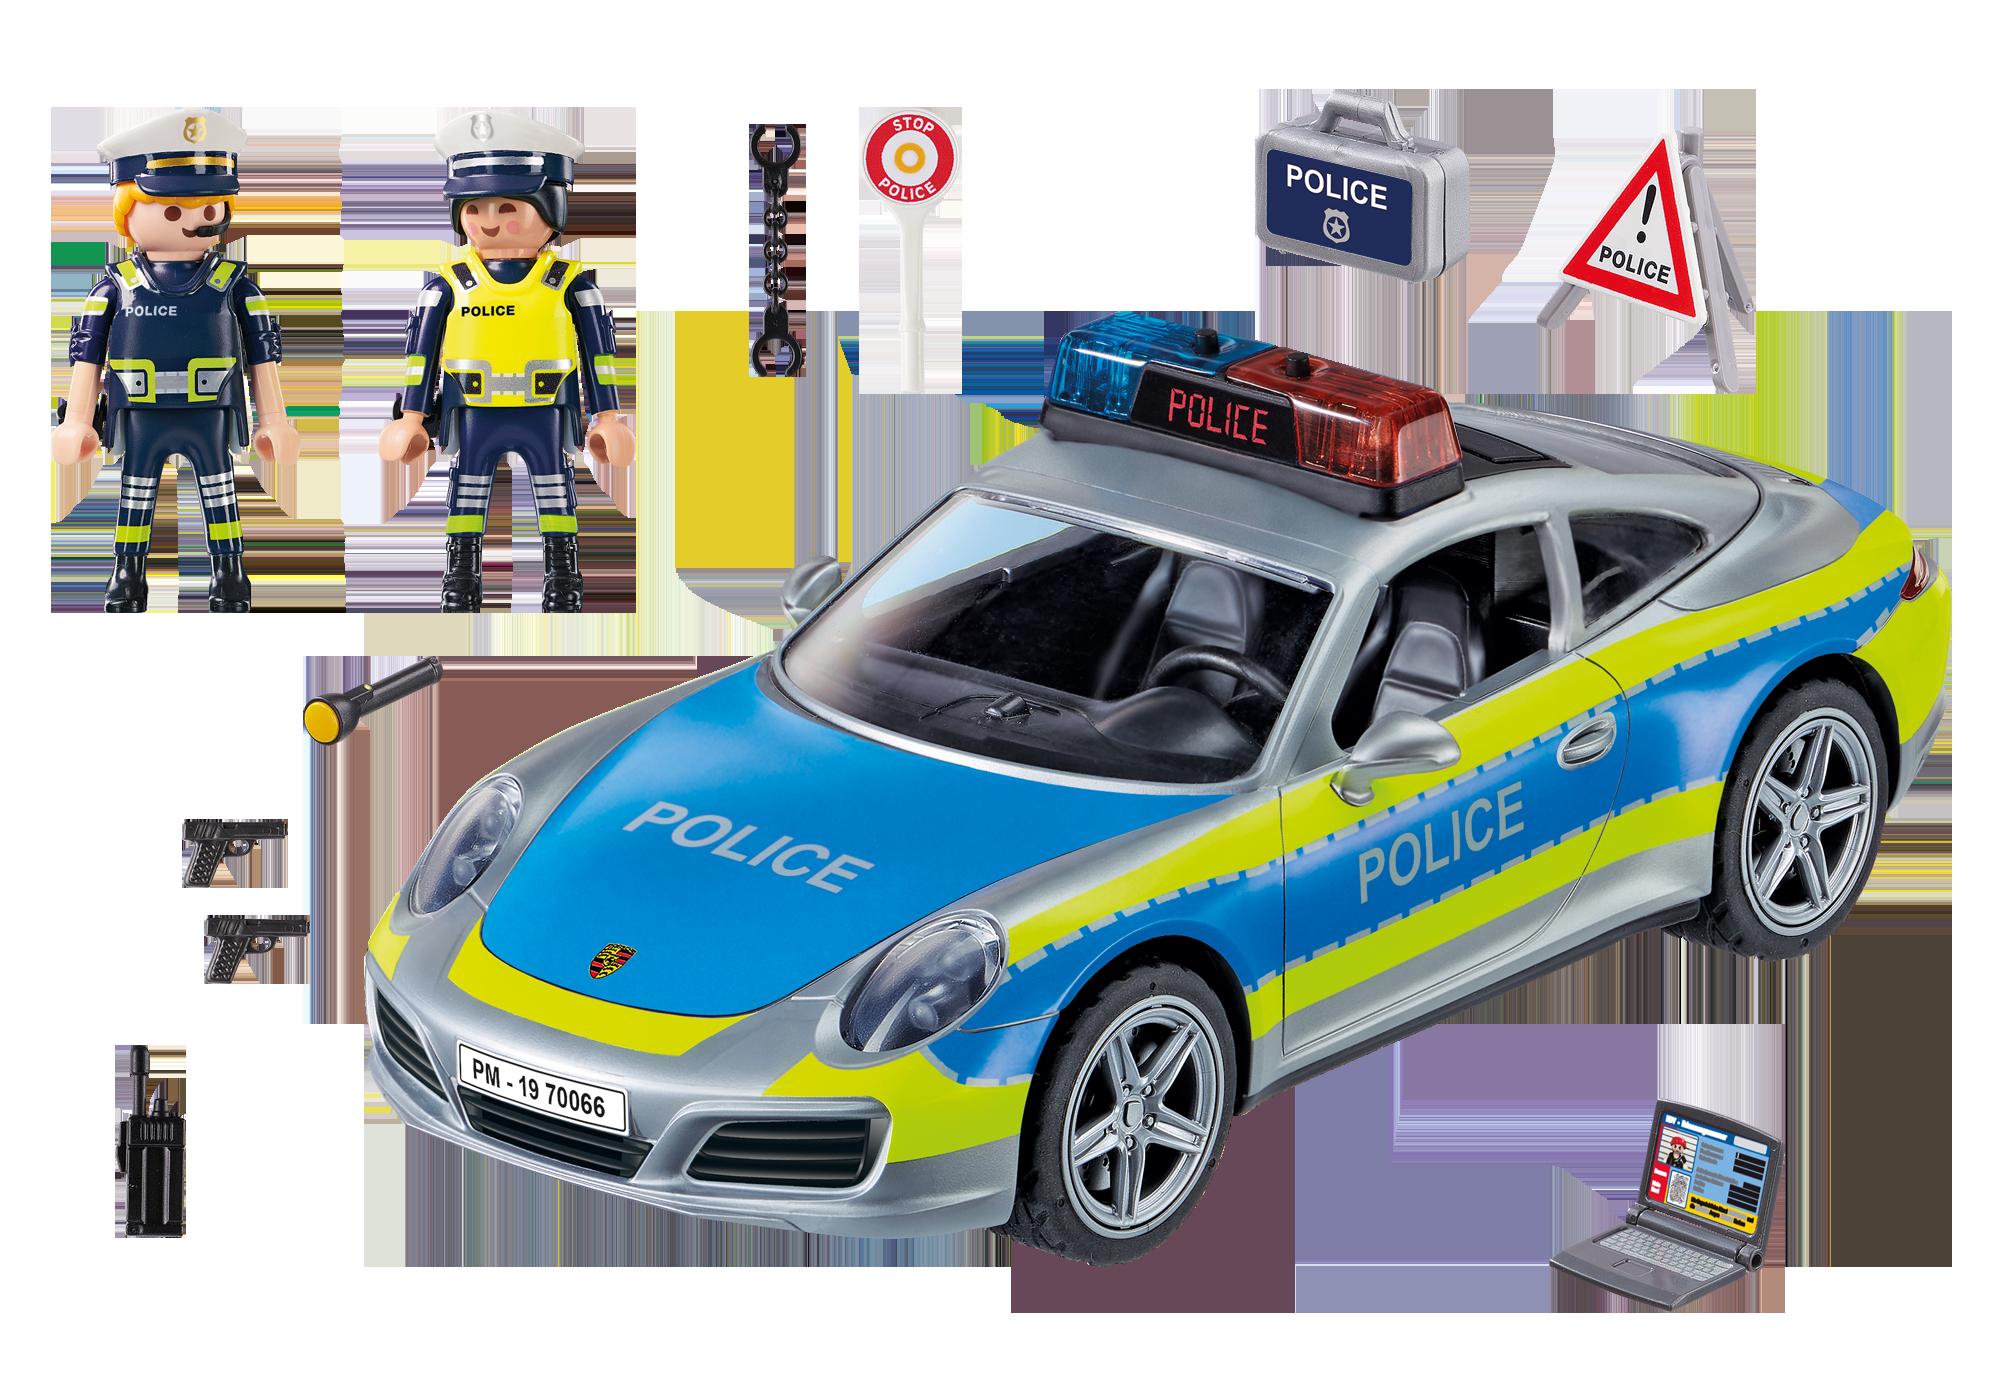 http://media.playmobil.com/i/playmobil/70066_product_box_back/Porsche 911 Carrera 4S Politi